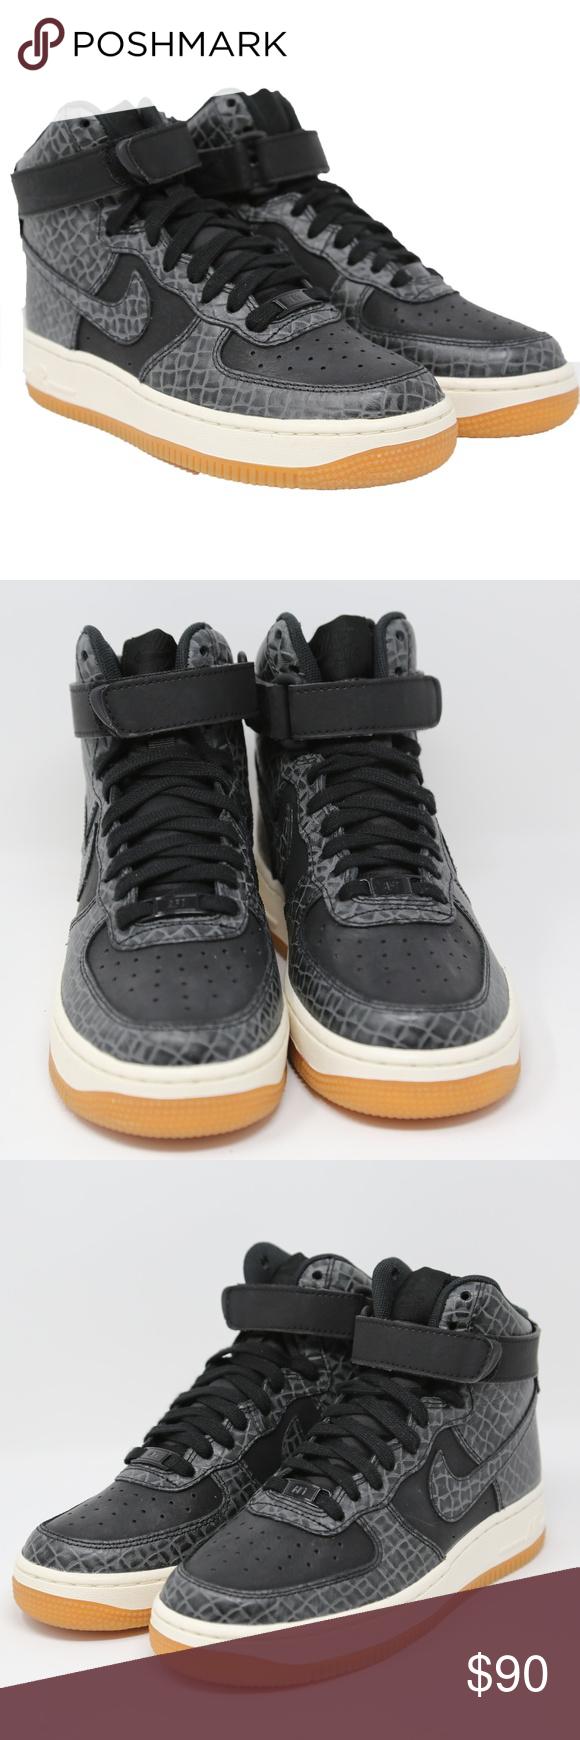 Nike Air Force 1 High Croc Skin Womens Black Gum Women's